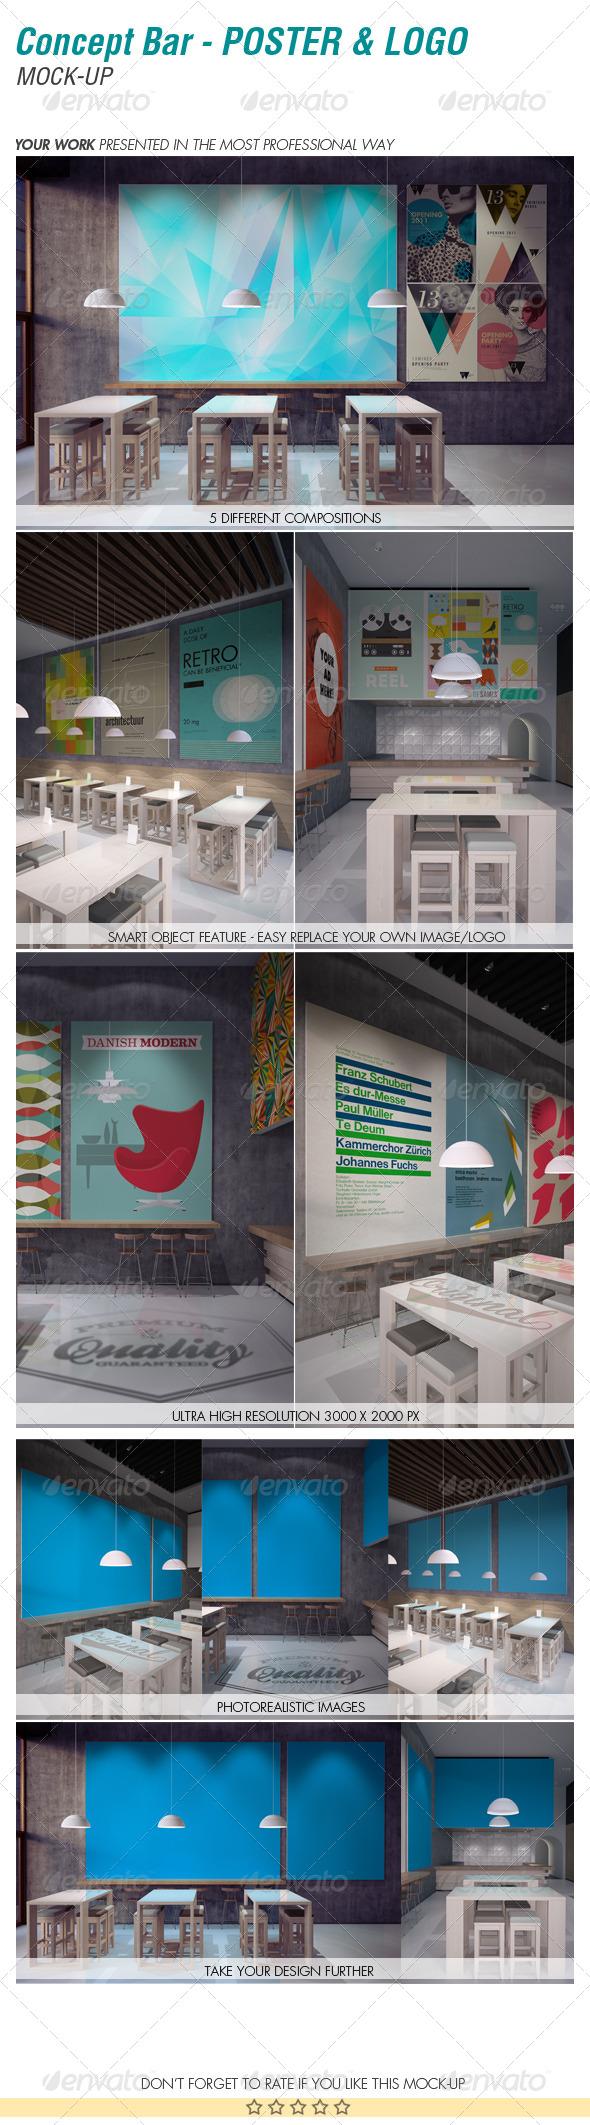 Concept Bar - Poster & Logo Mock-up - Product Mock-Ups Graphics